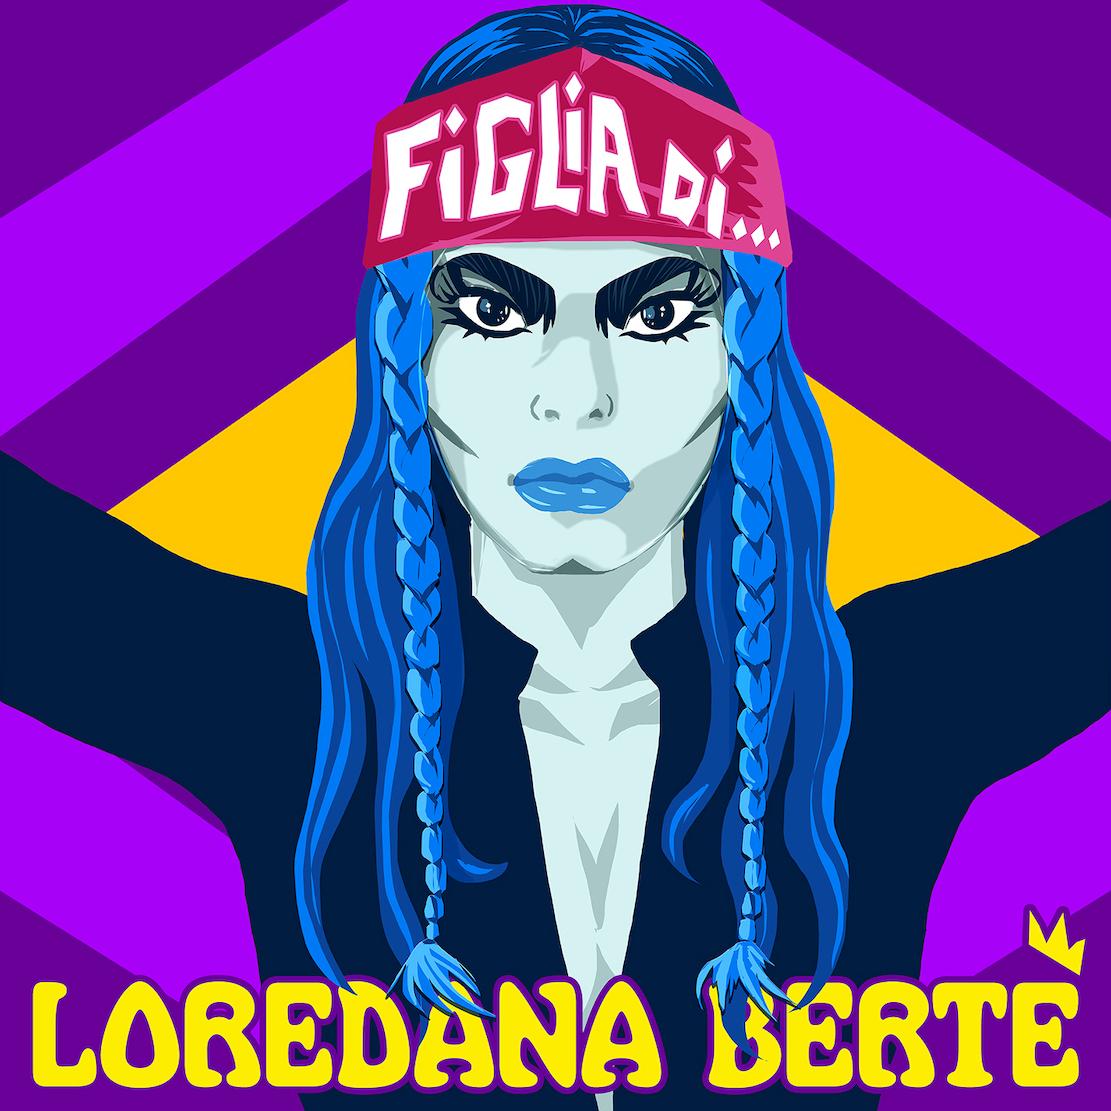 Loredana Bertè nuovo album